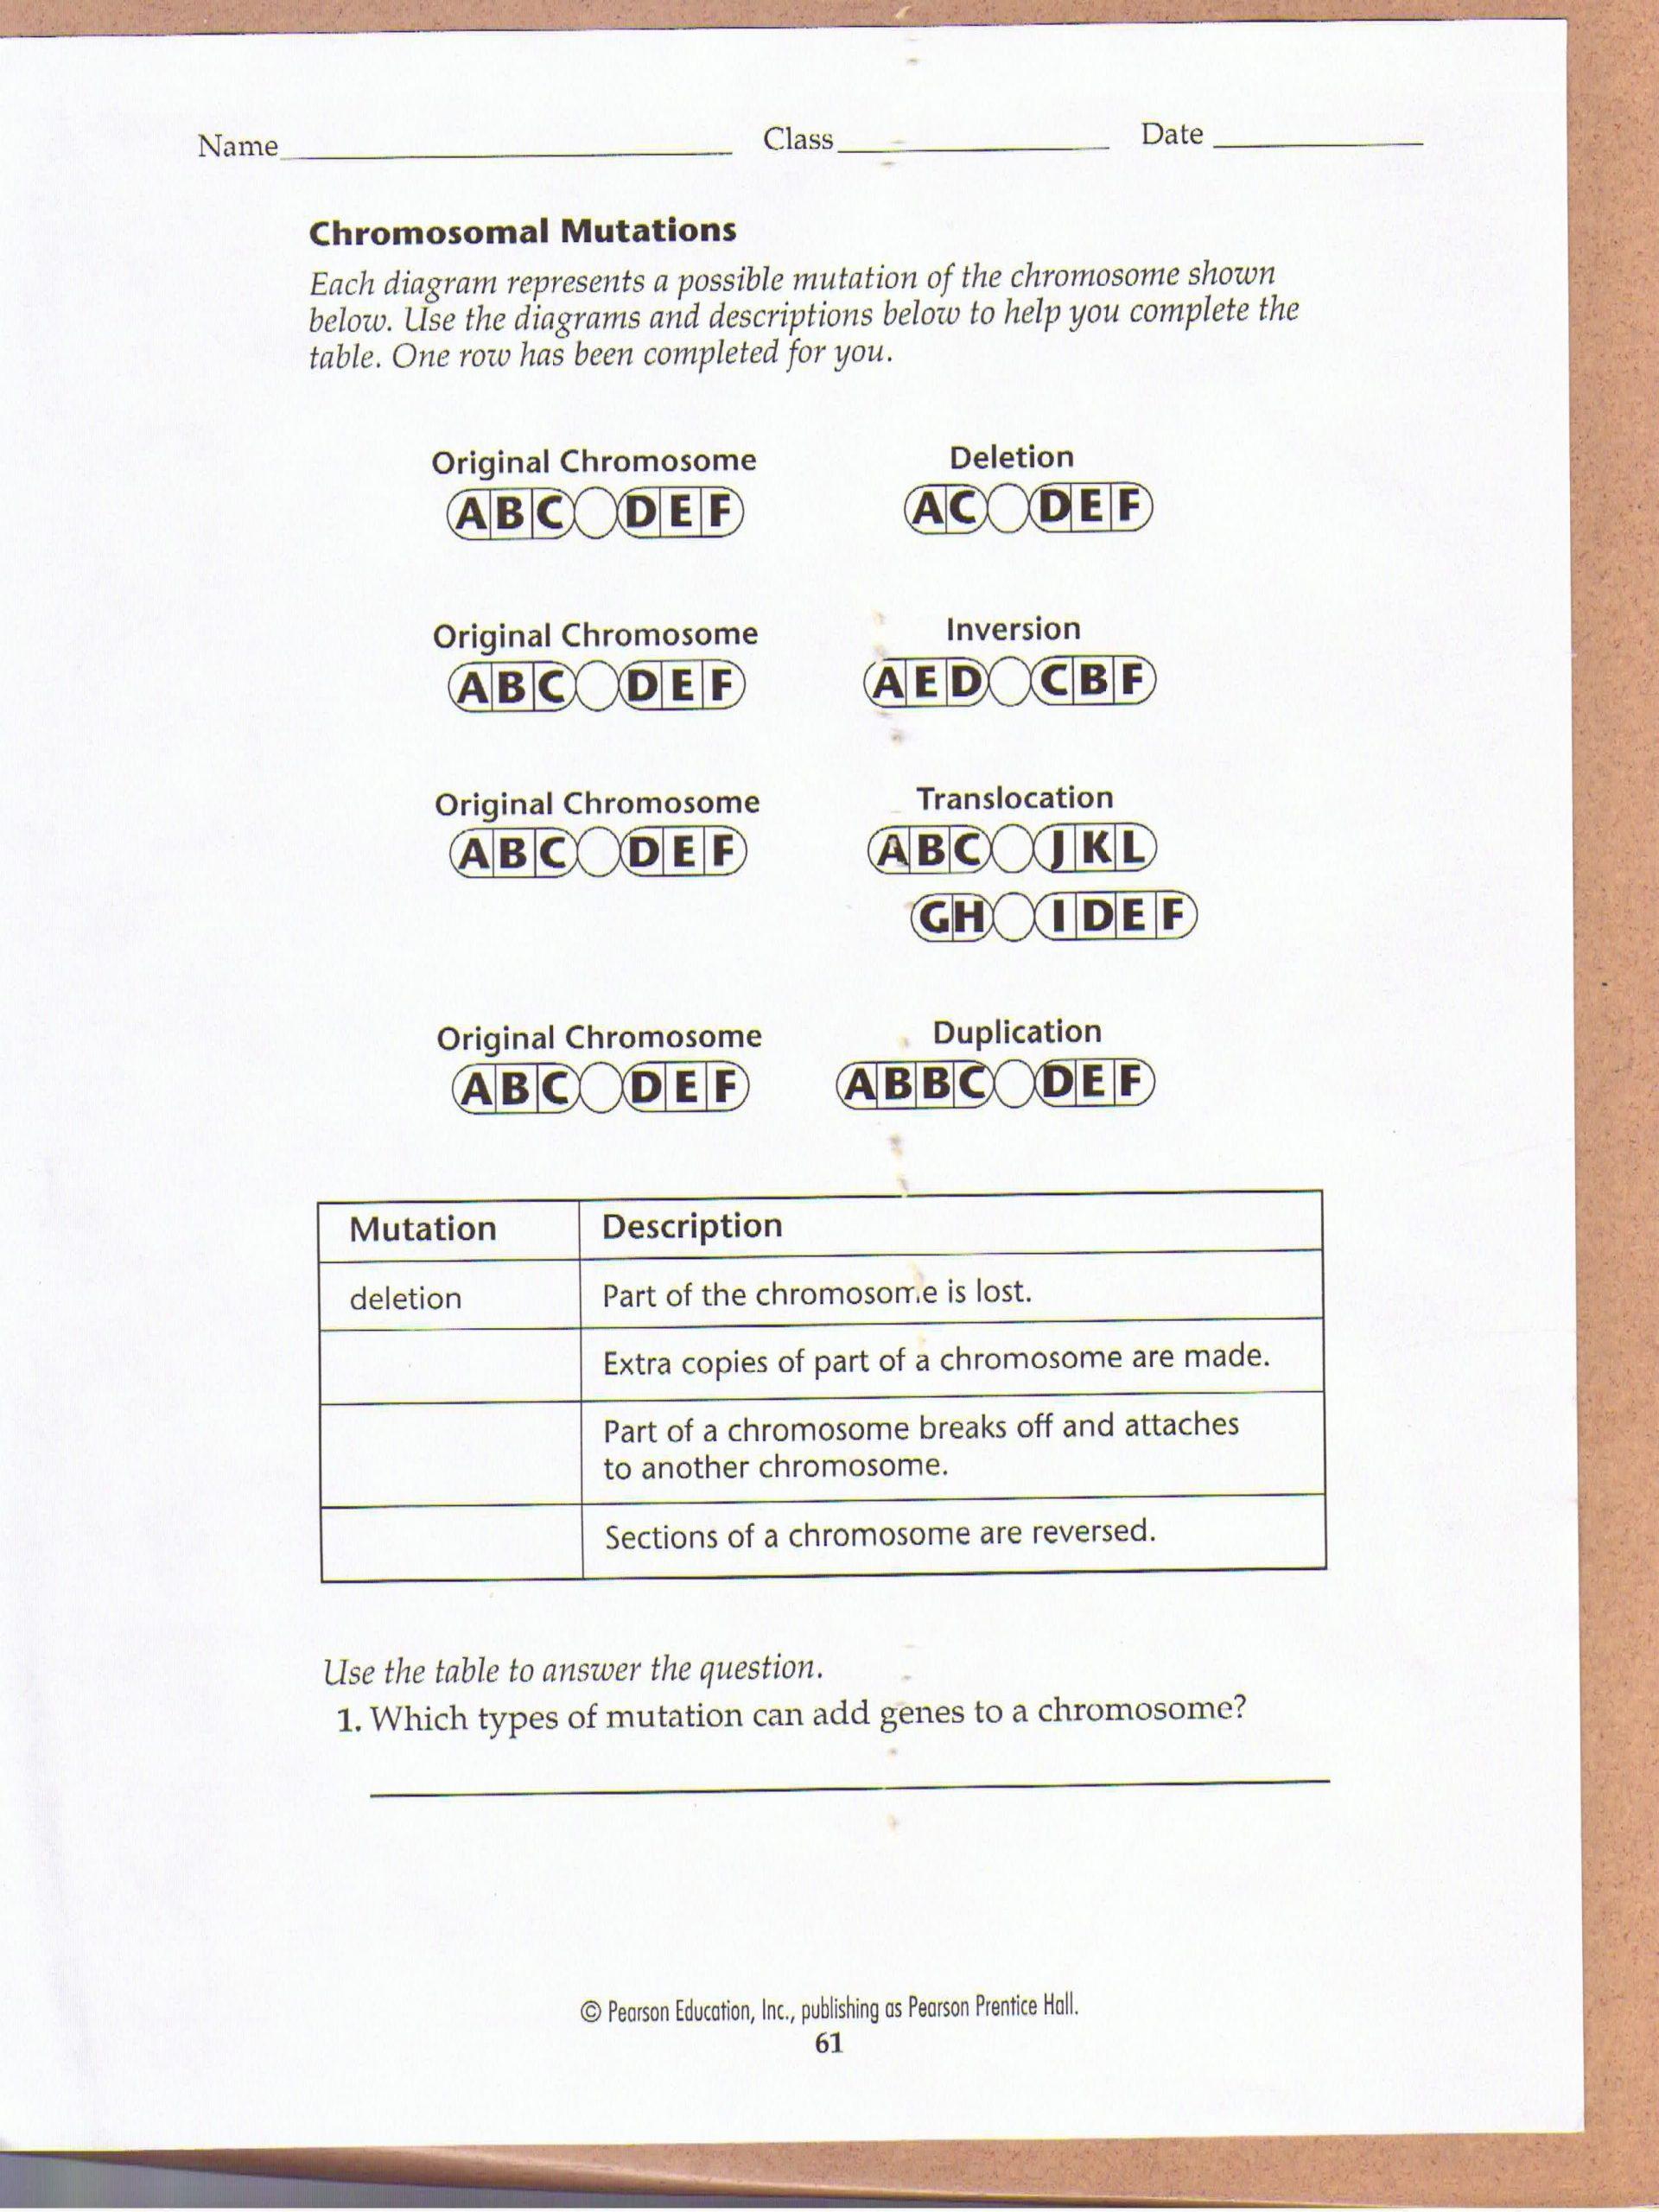 Gene and Chromosome Mutation Worksheet Chromosomal Mutations Worksheet